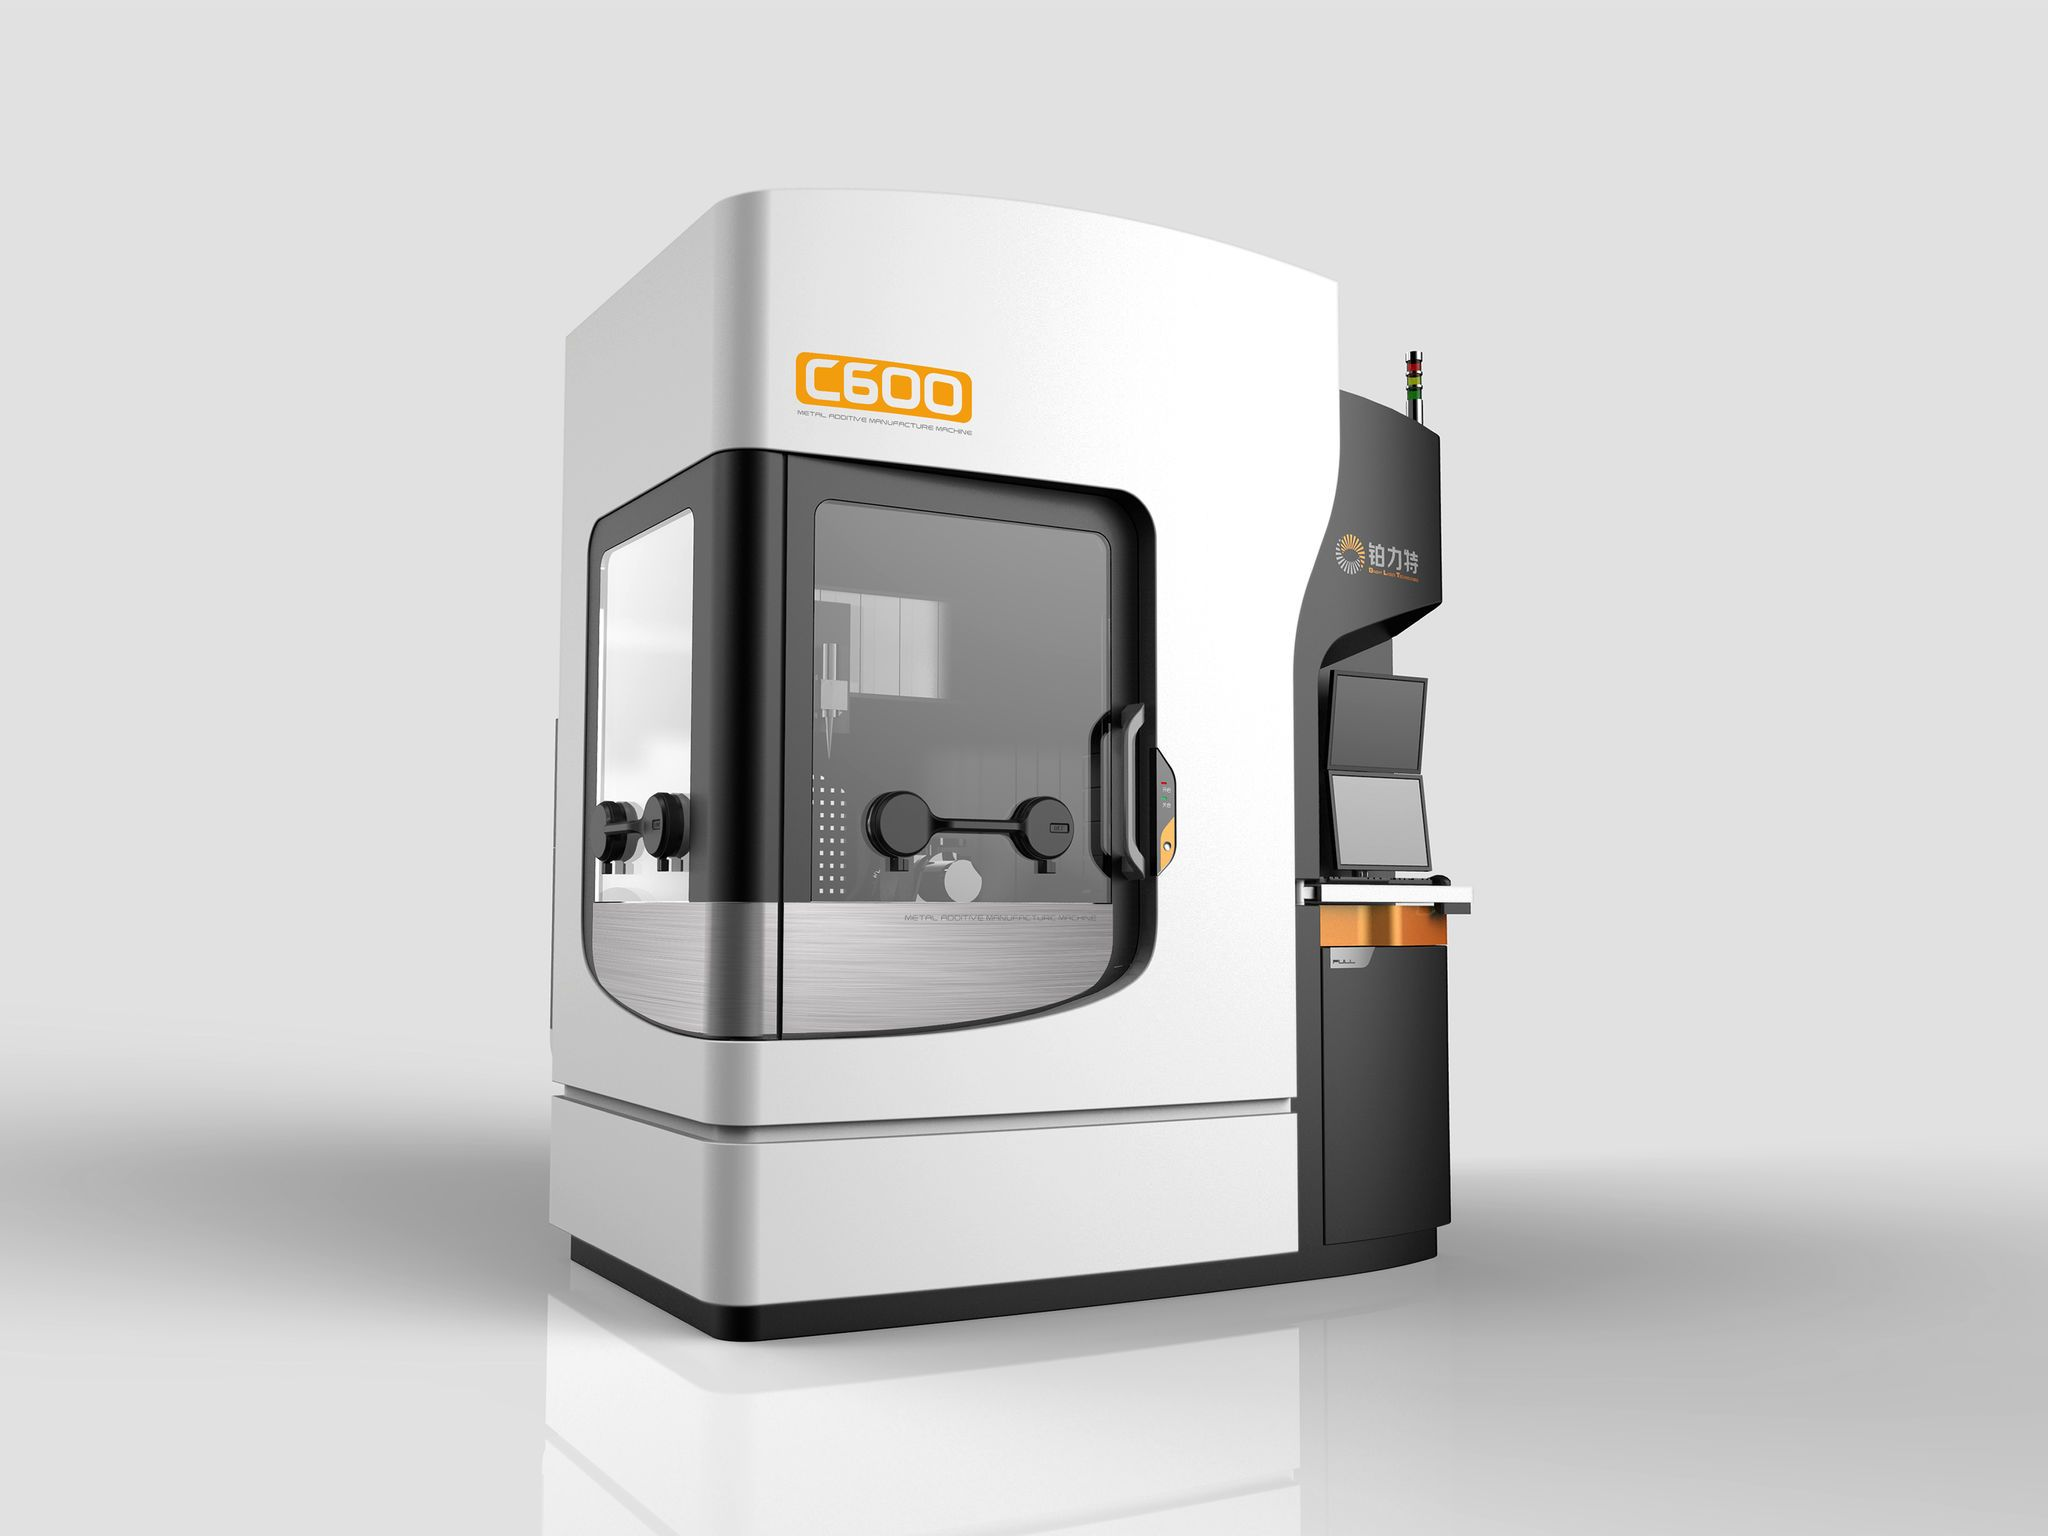 C600 - Entry - iF WORLD DESIGN GUIDE   Machine Design - Housings ...